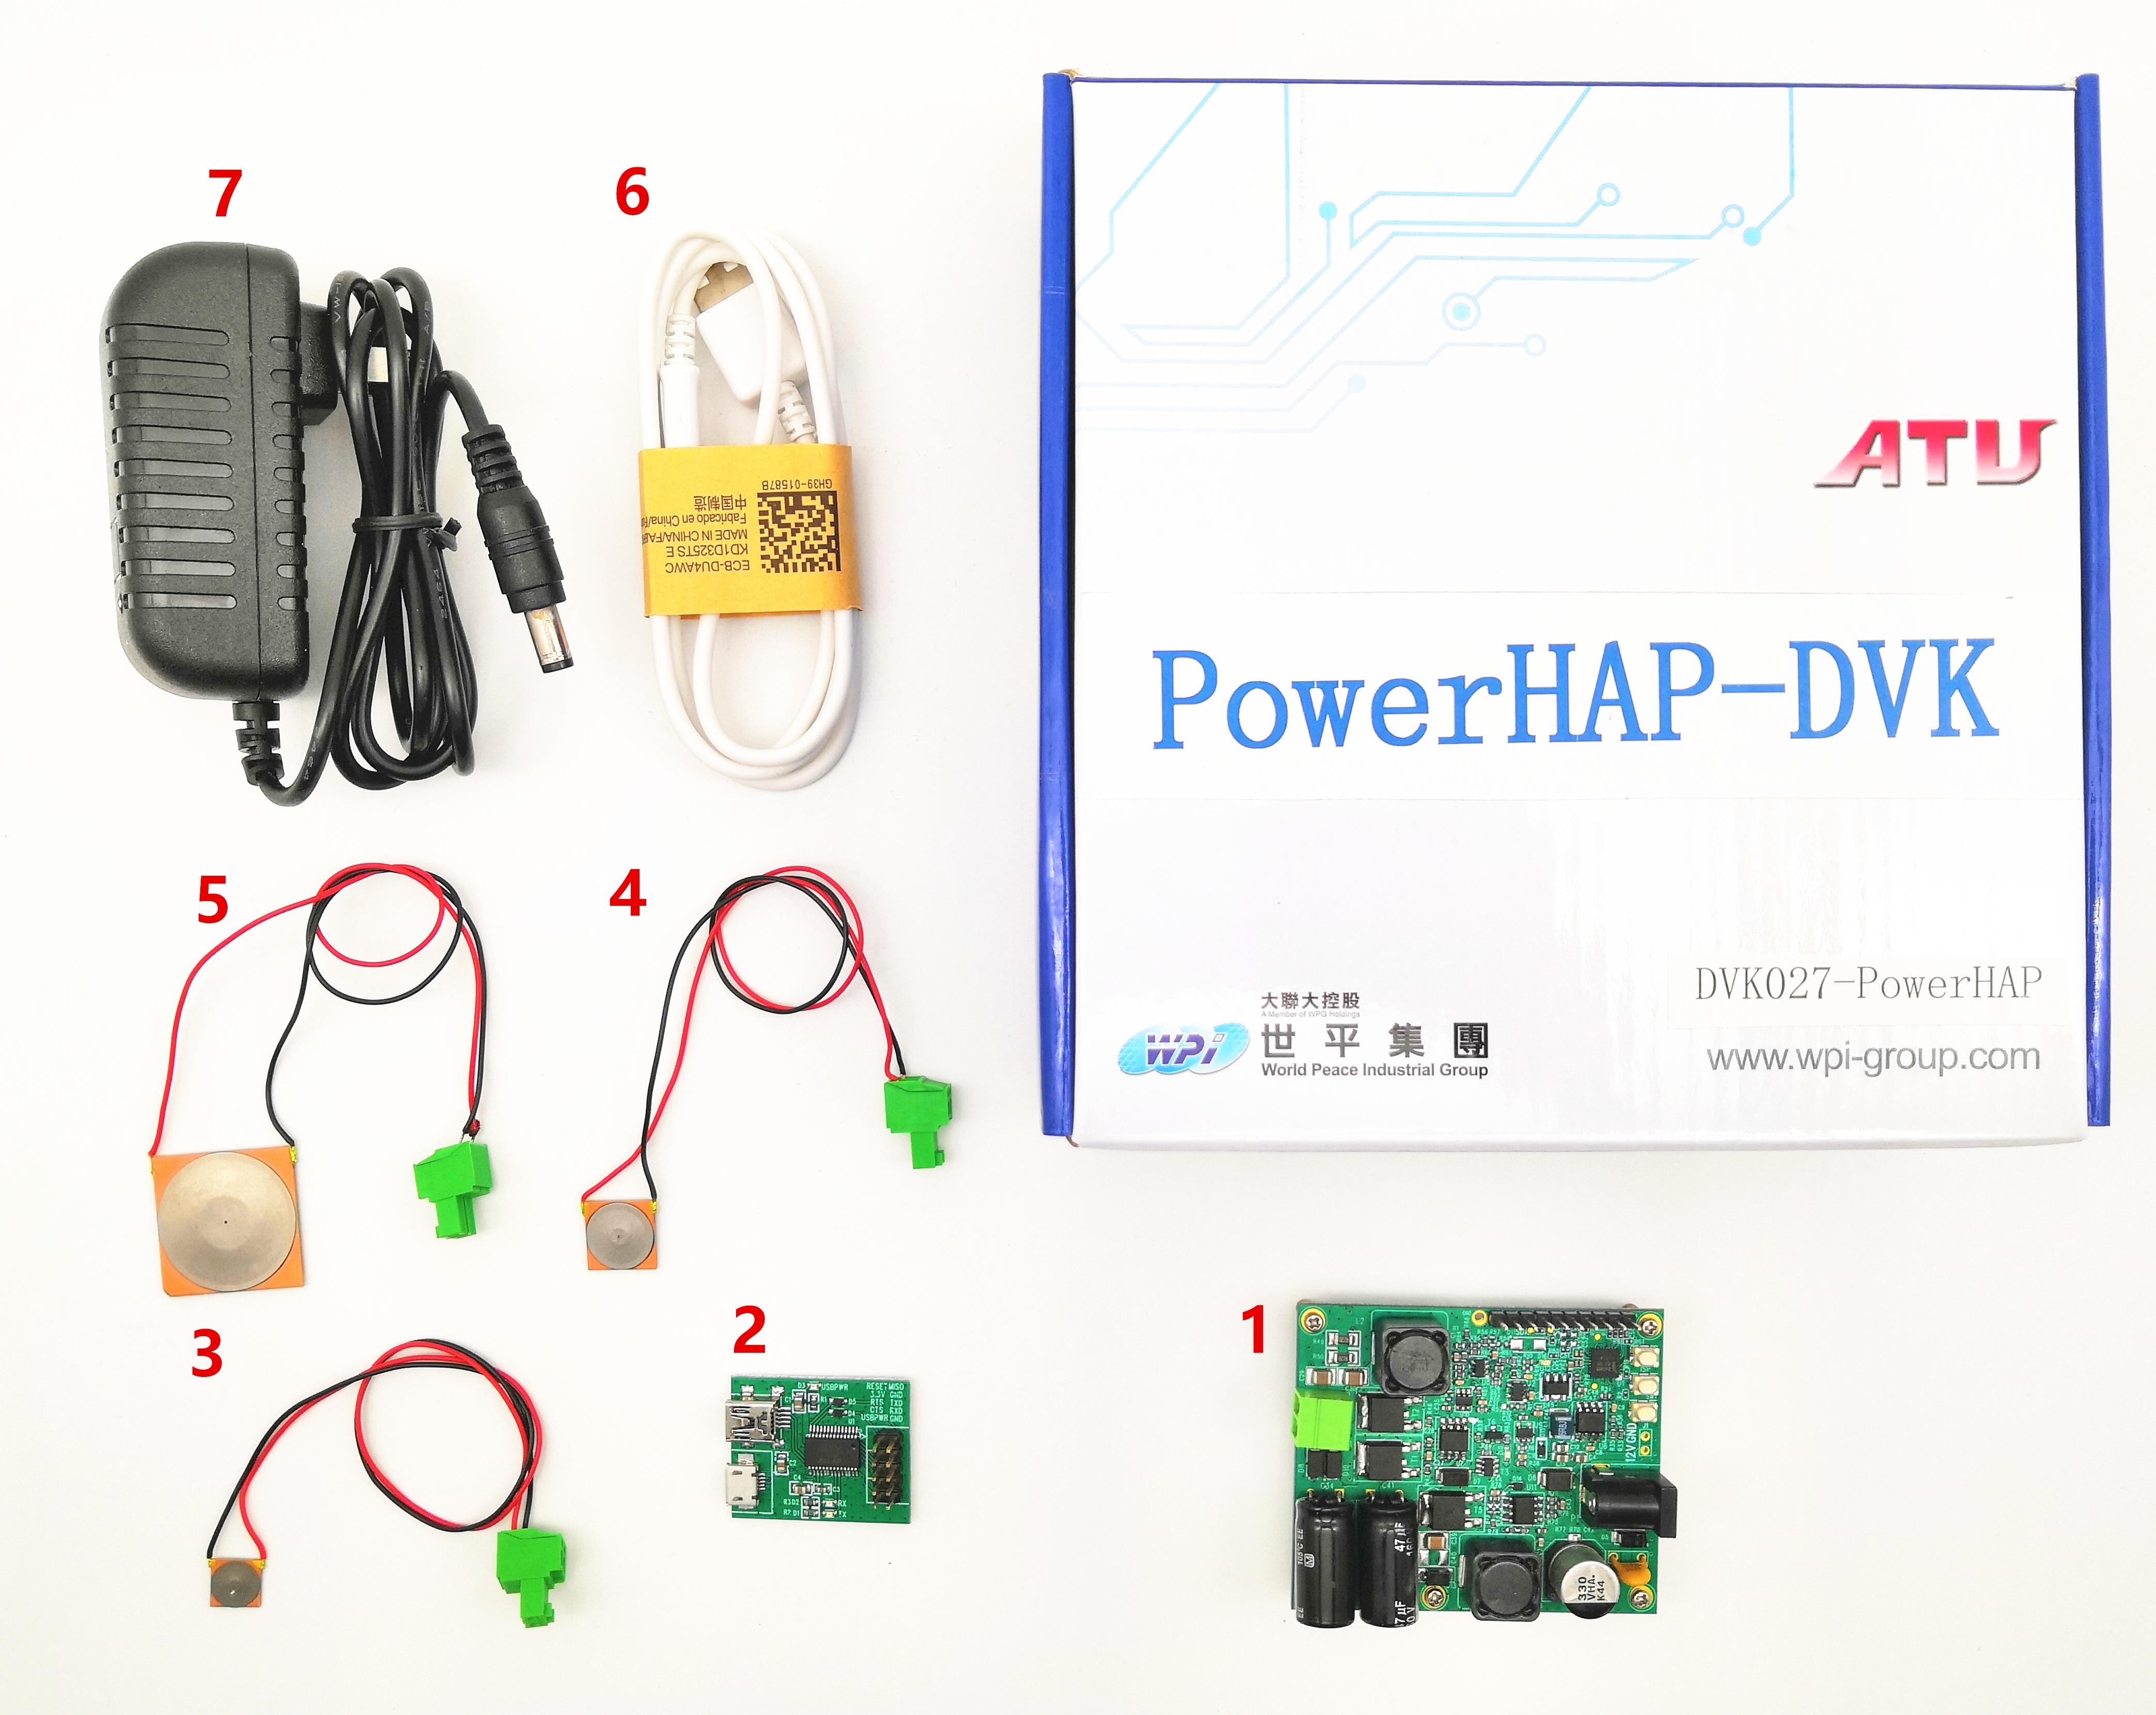 DVK027-POWERHAP